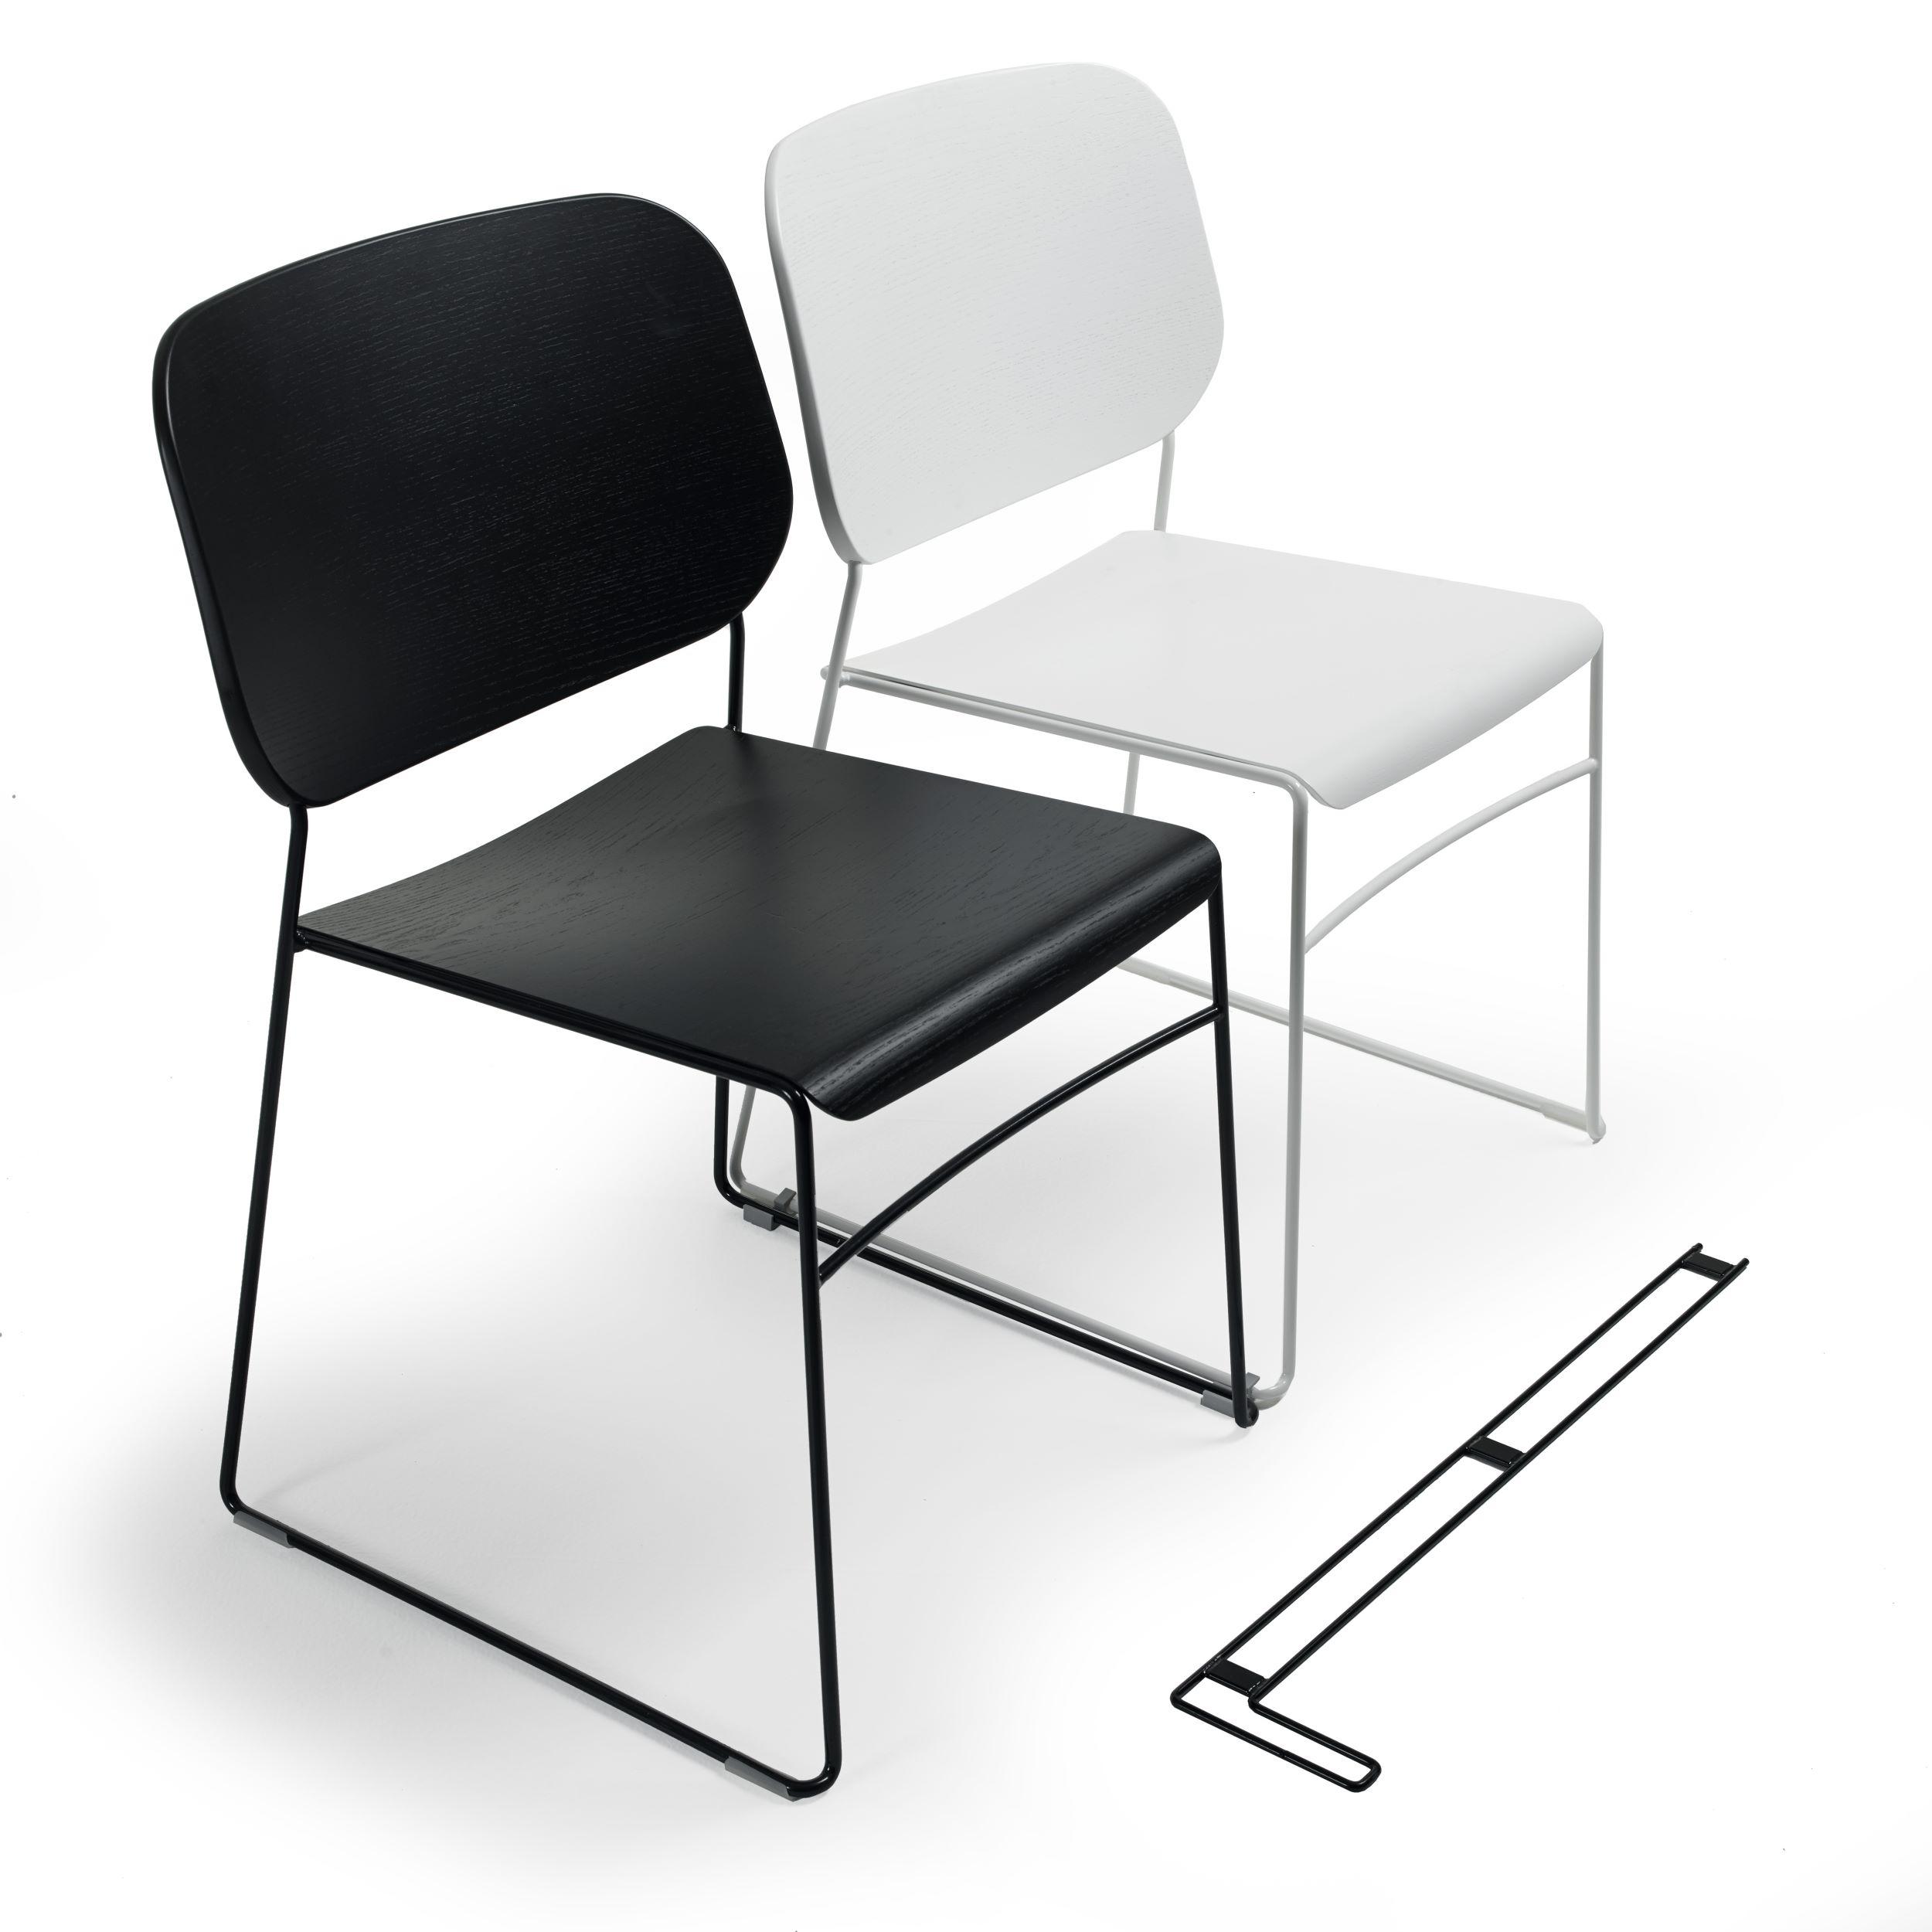 Lite, Stapelbar stol by Broberg & Ridderstråle